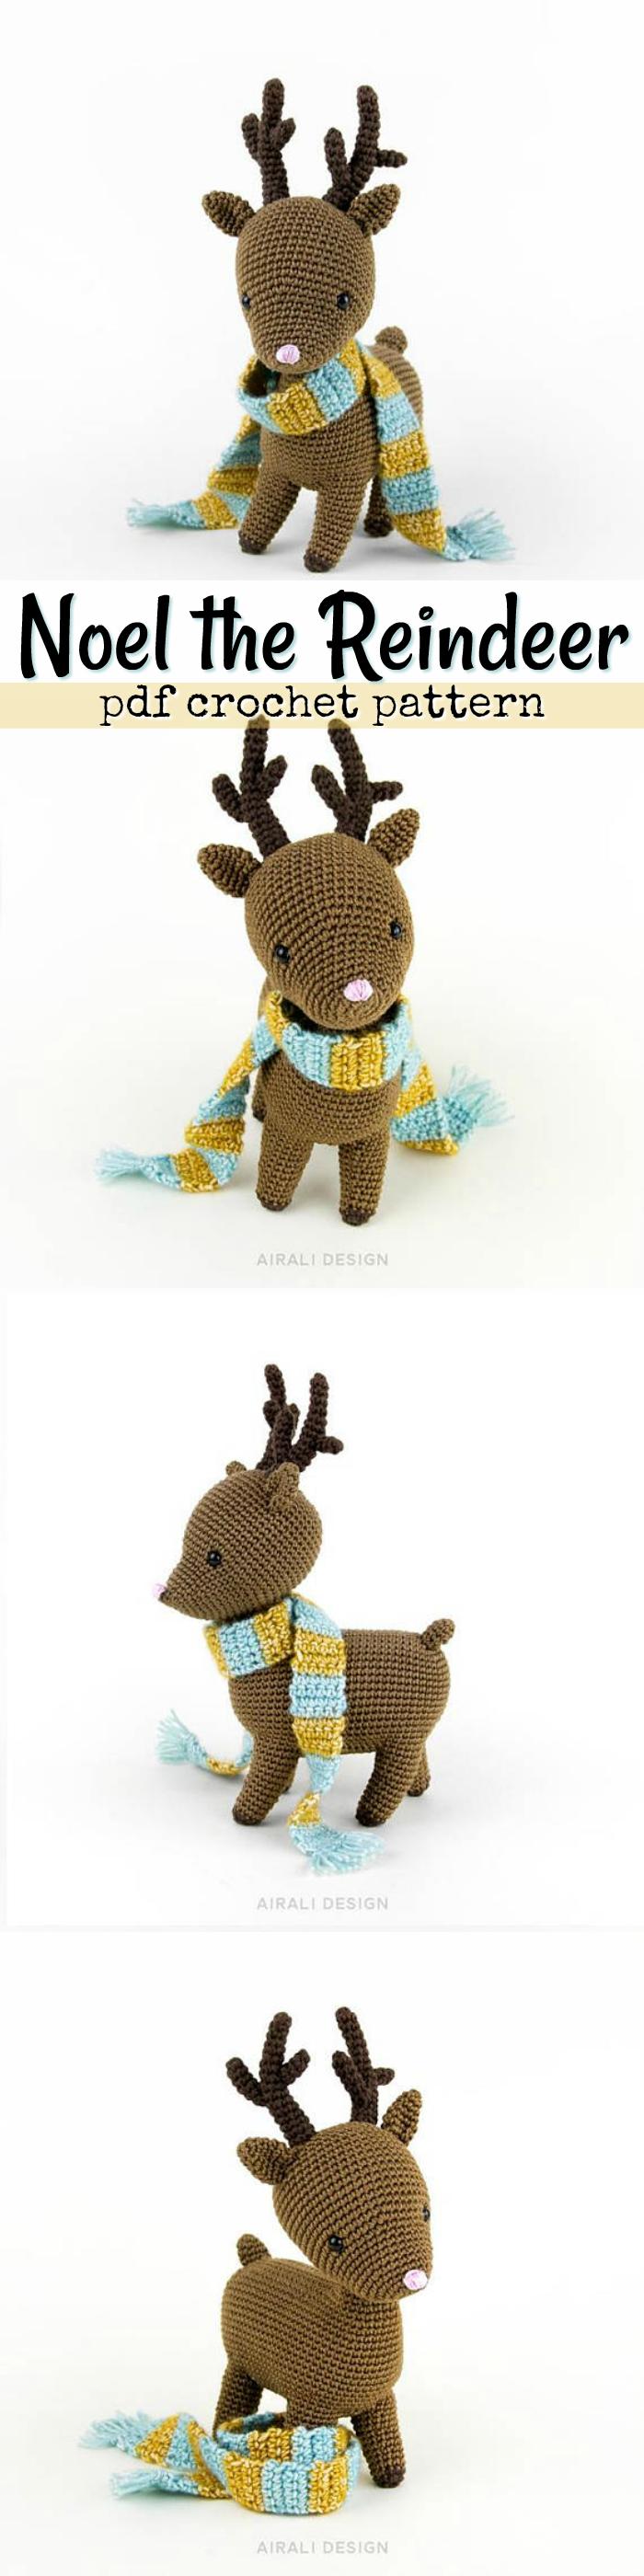 Noel the reindeer pdf crochet pattern sweet little christmas deer noel the reindeer pdf crochet pattern sweet little christmas deer to crochet love these bankloansurffo Choice Image